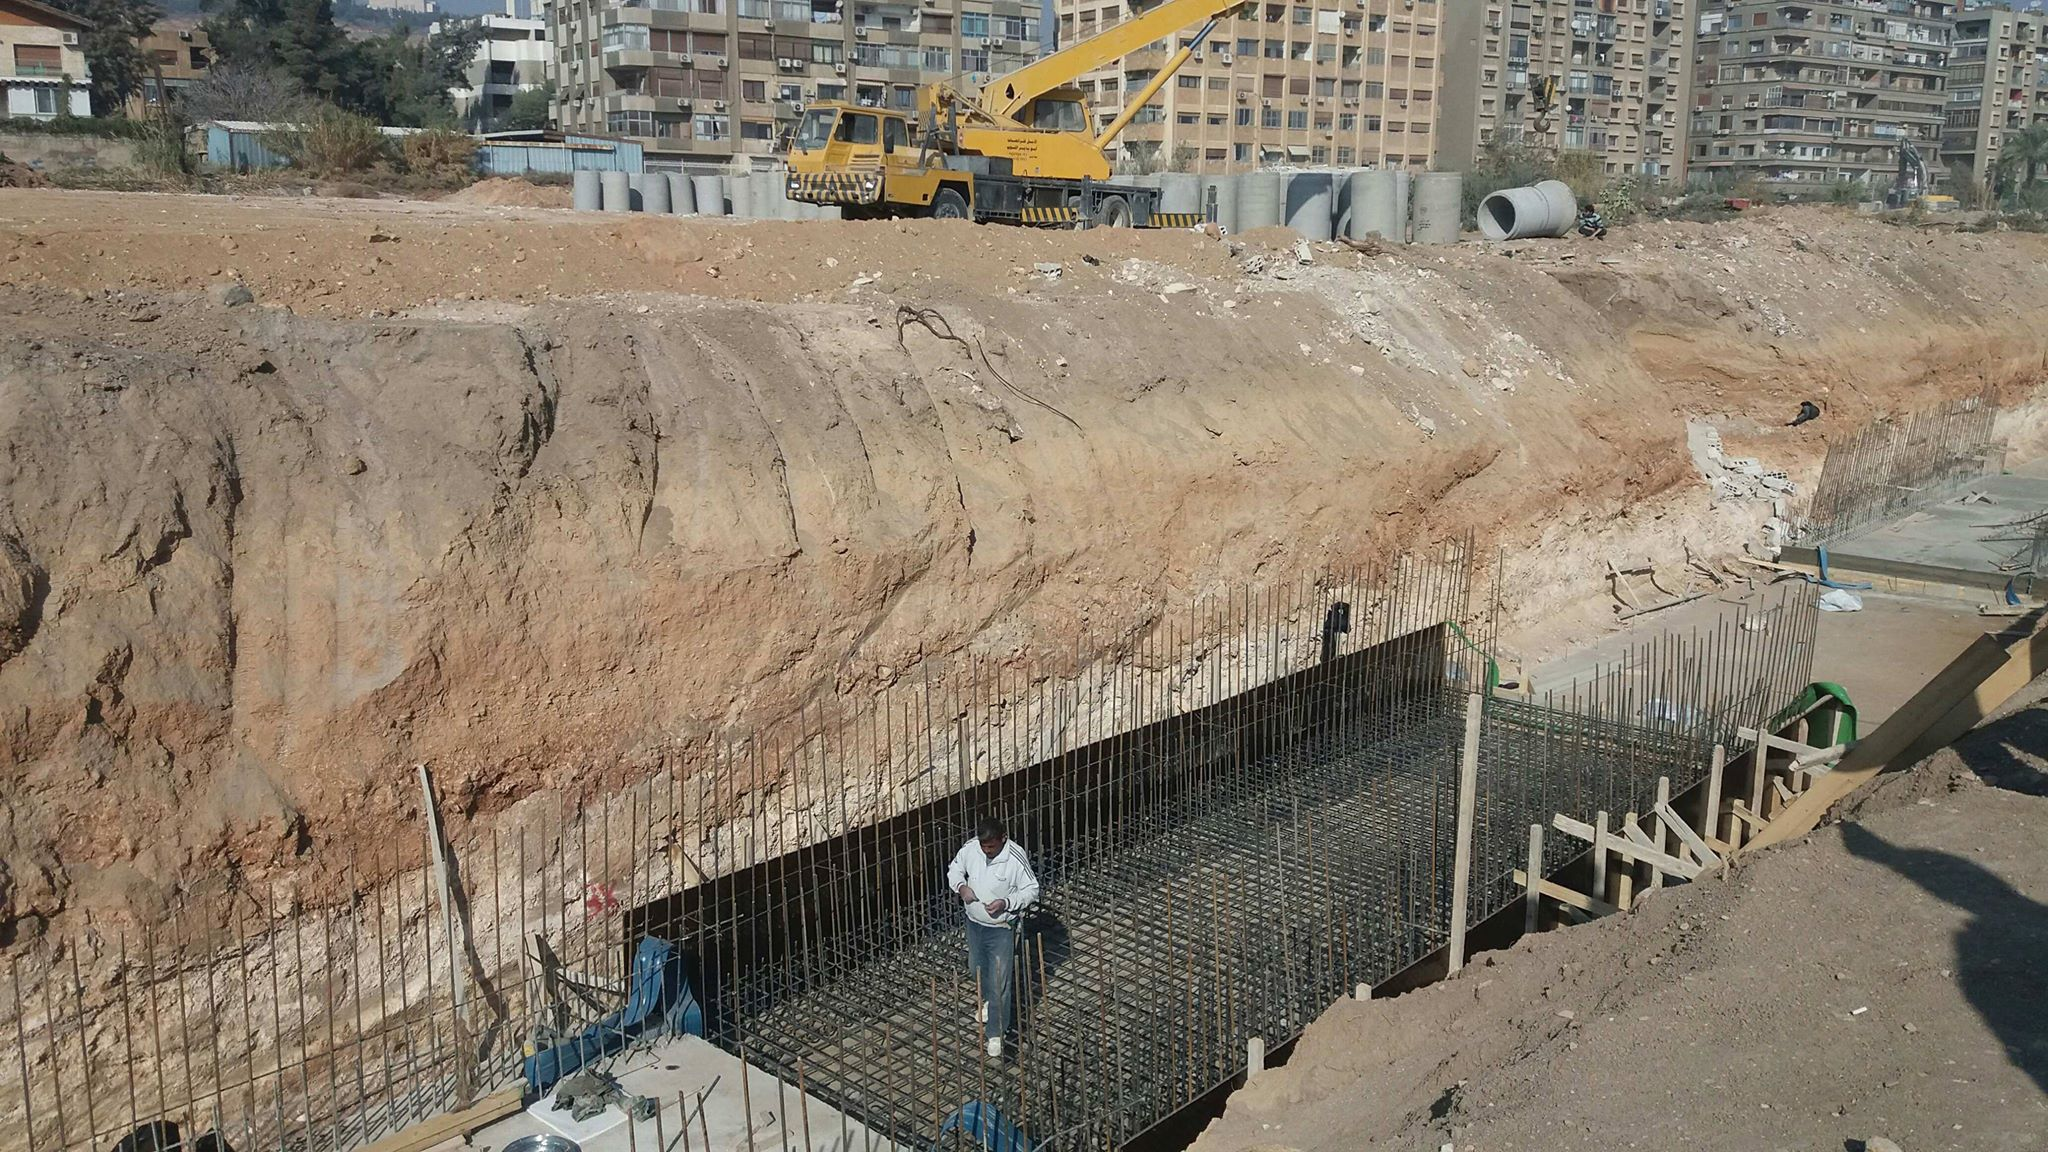 Photo of مخلوف: دراسات لتنظيم مدخل دمشق وباب عمر وعشوائيات في حلب